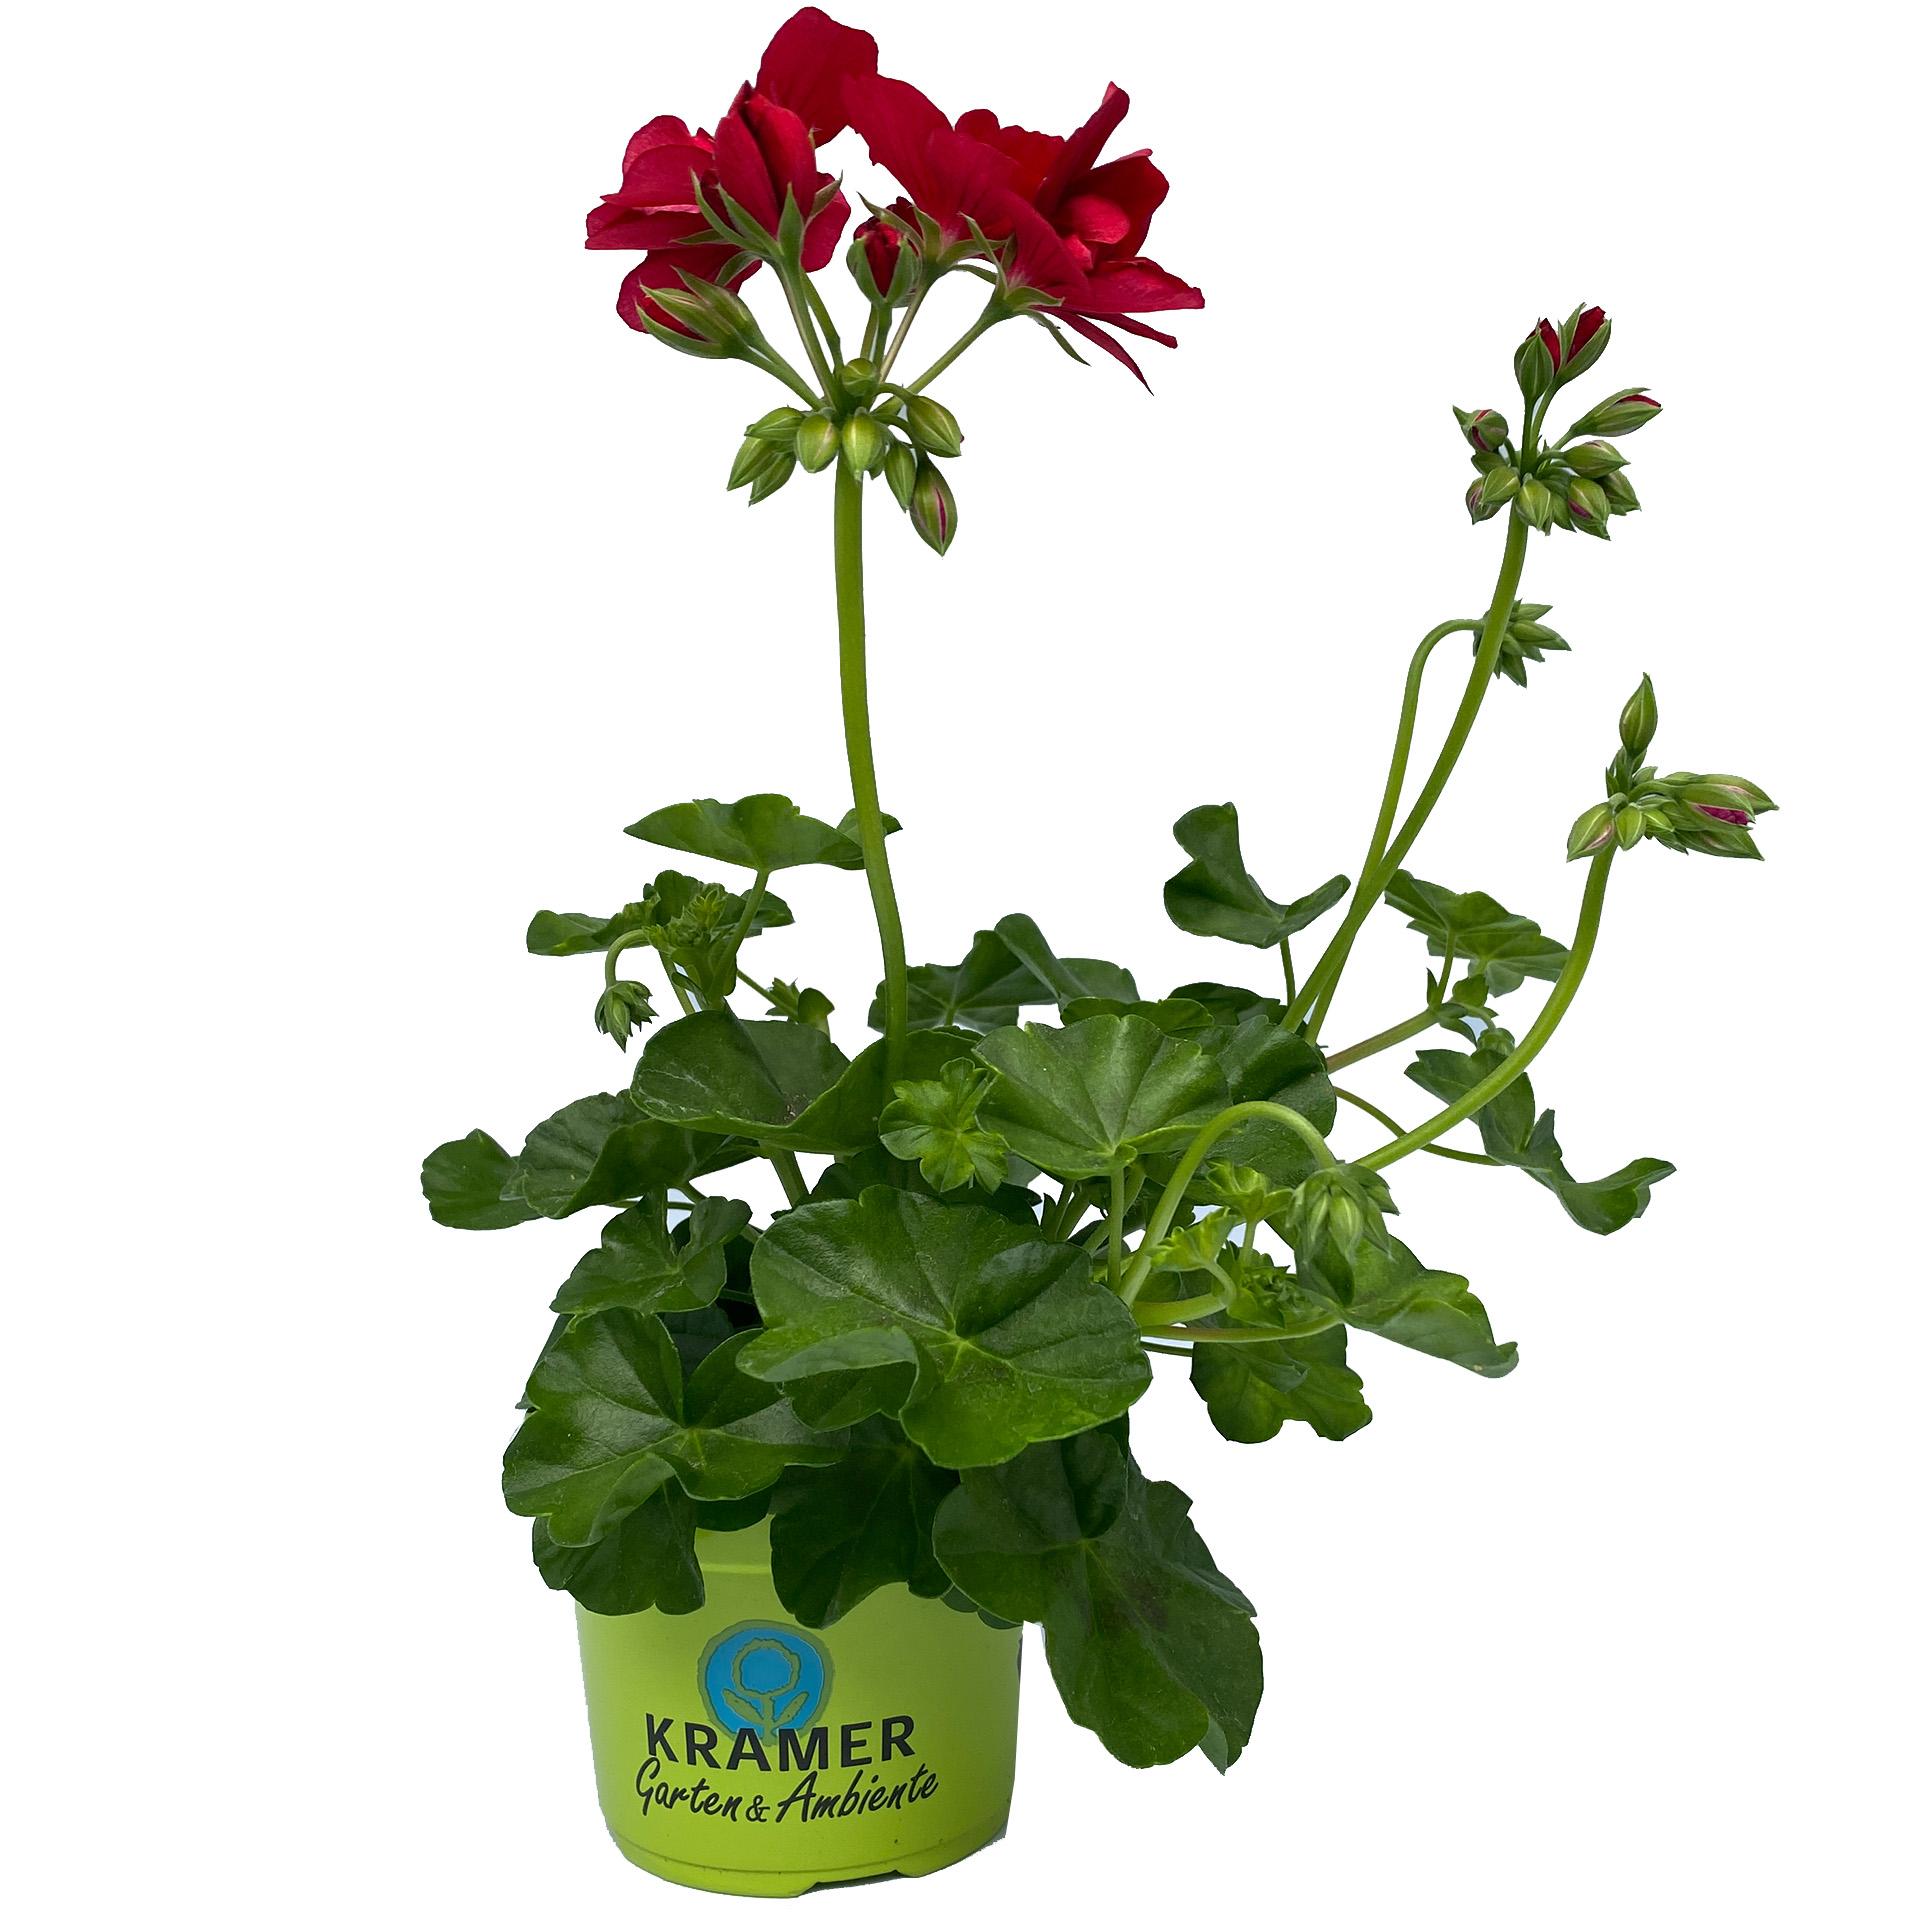 Geranie hängend - Pelargonium peltatum 'Sunflair Ruben' dunkelrot, 12cm Topf